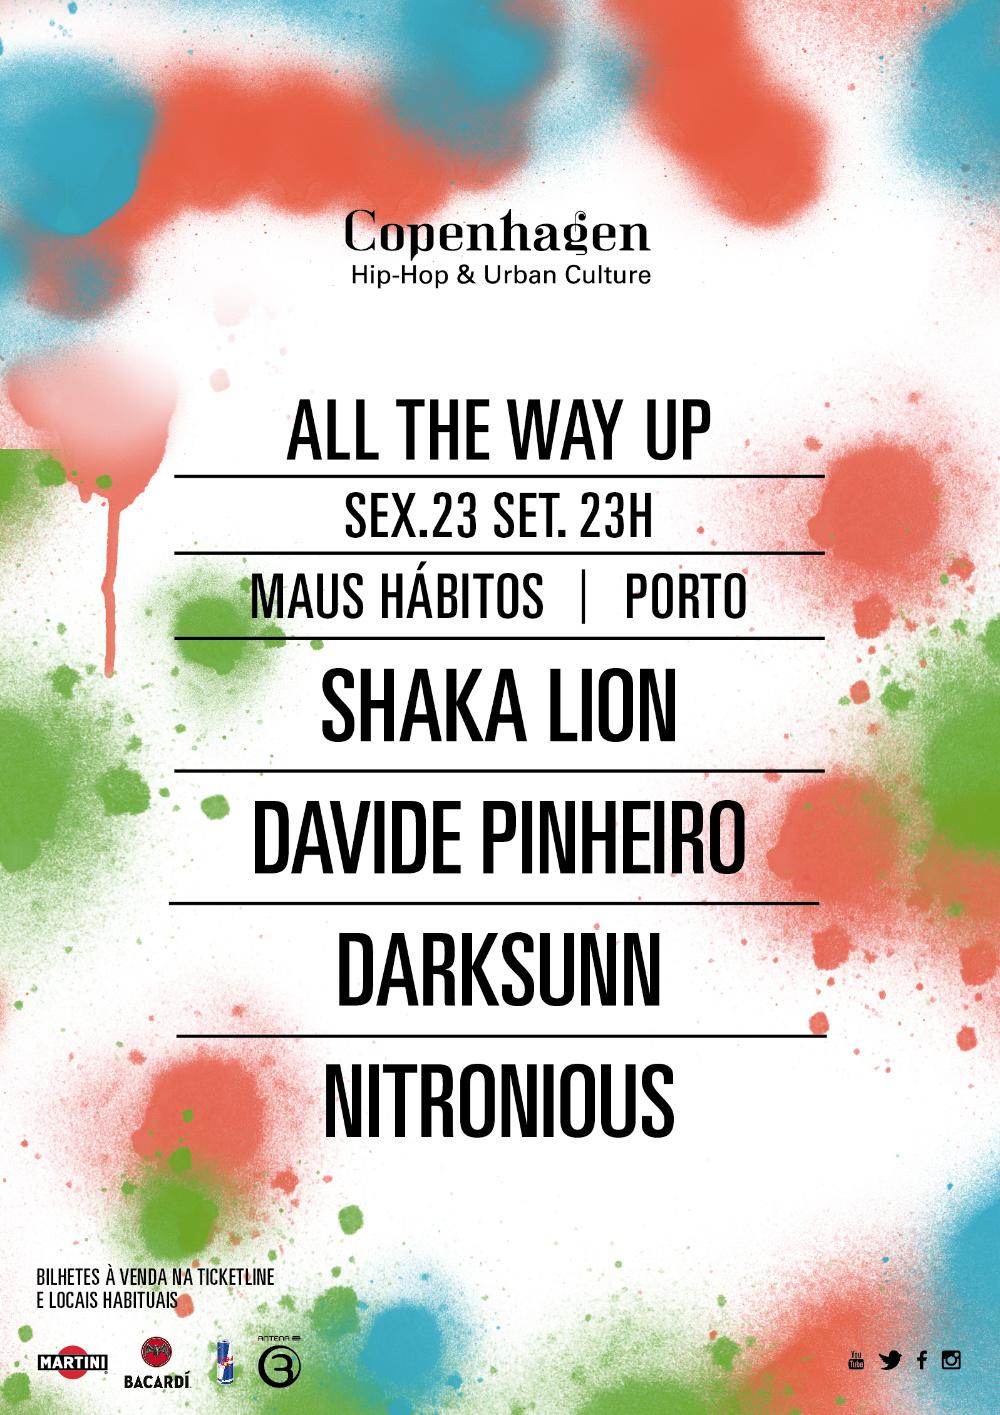 aniversario4copenhagen_03